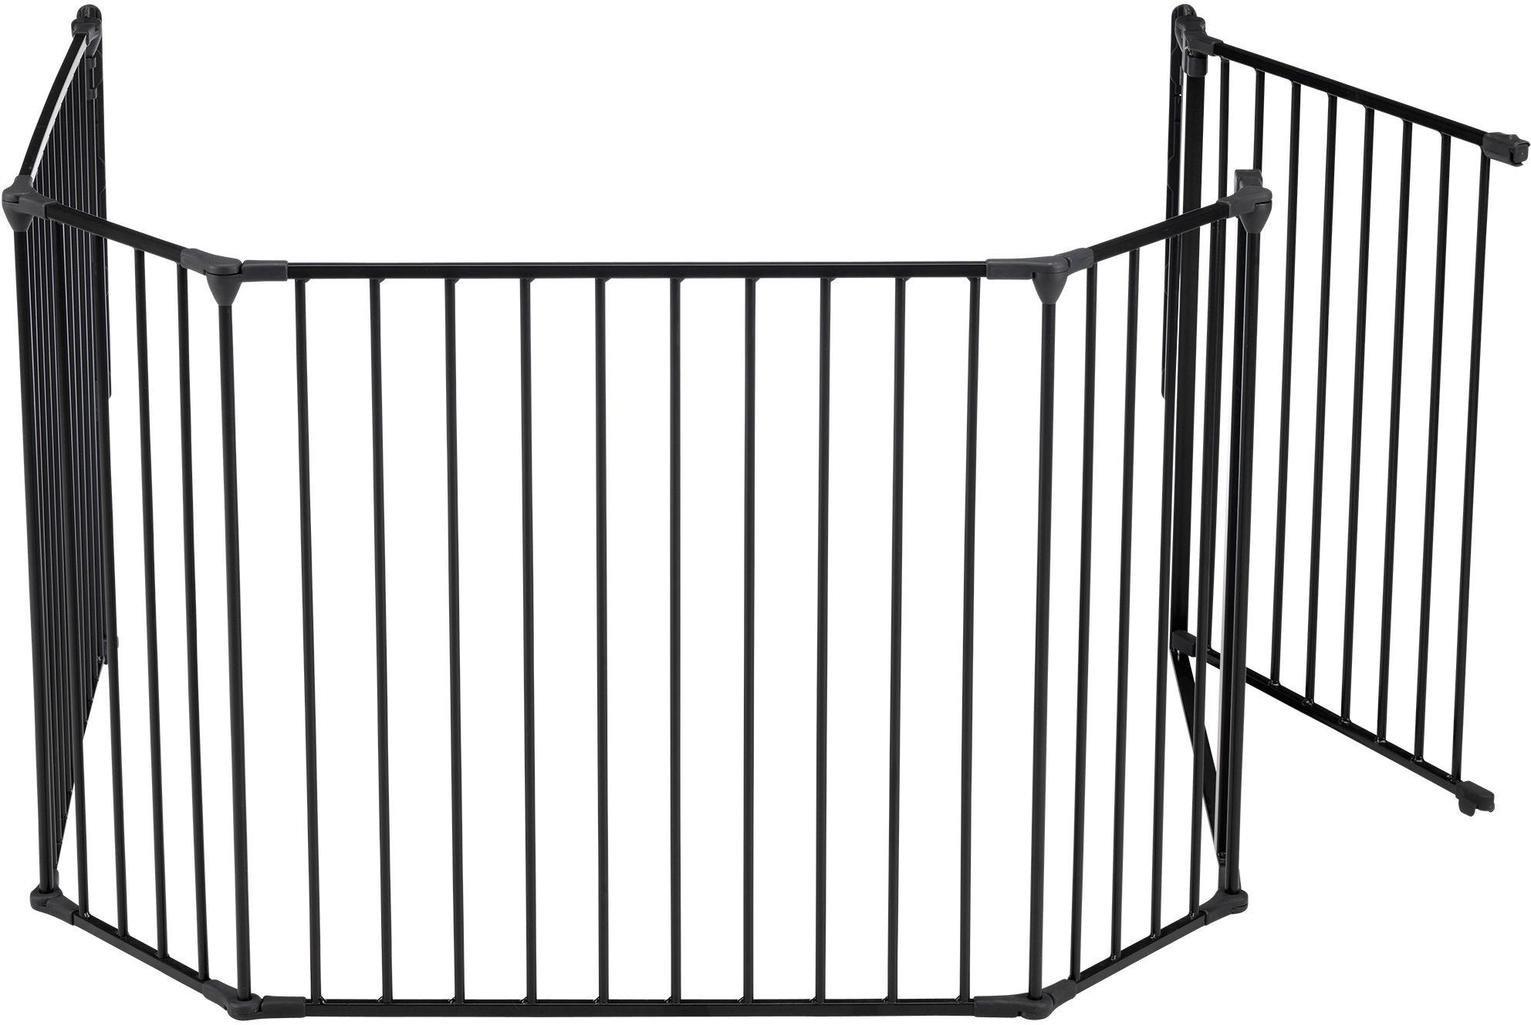 BabyDan XL Hearth Gate / Configure Gate - Black